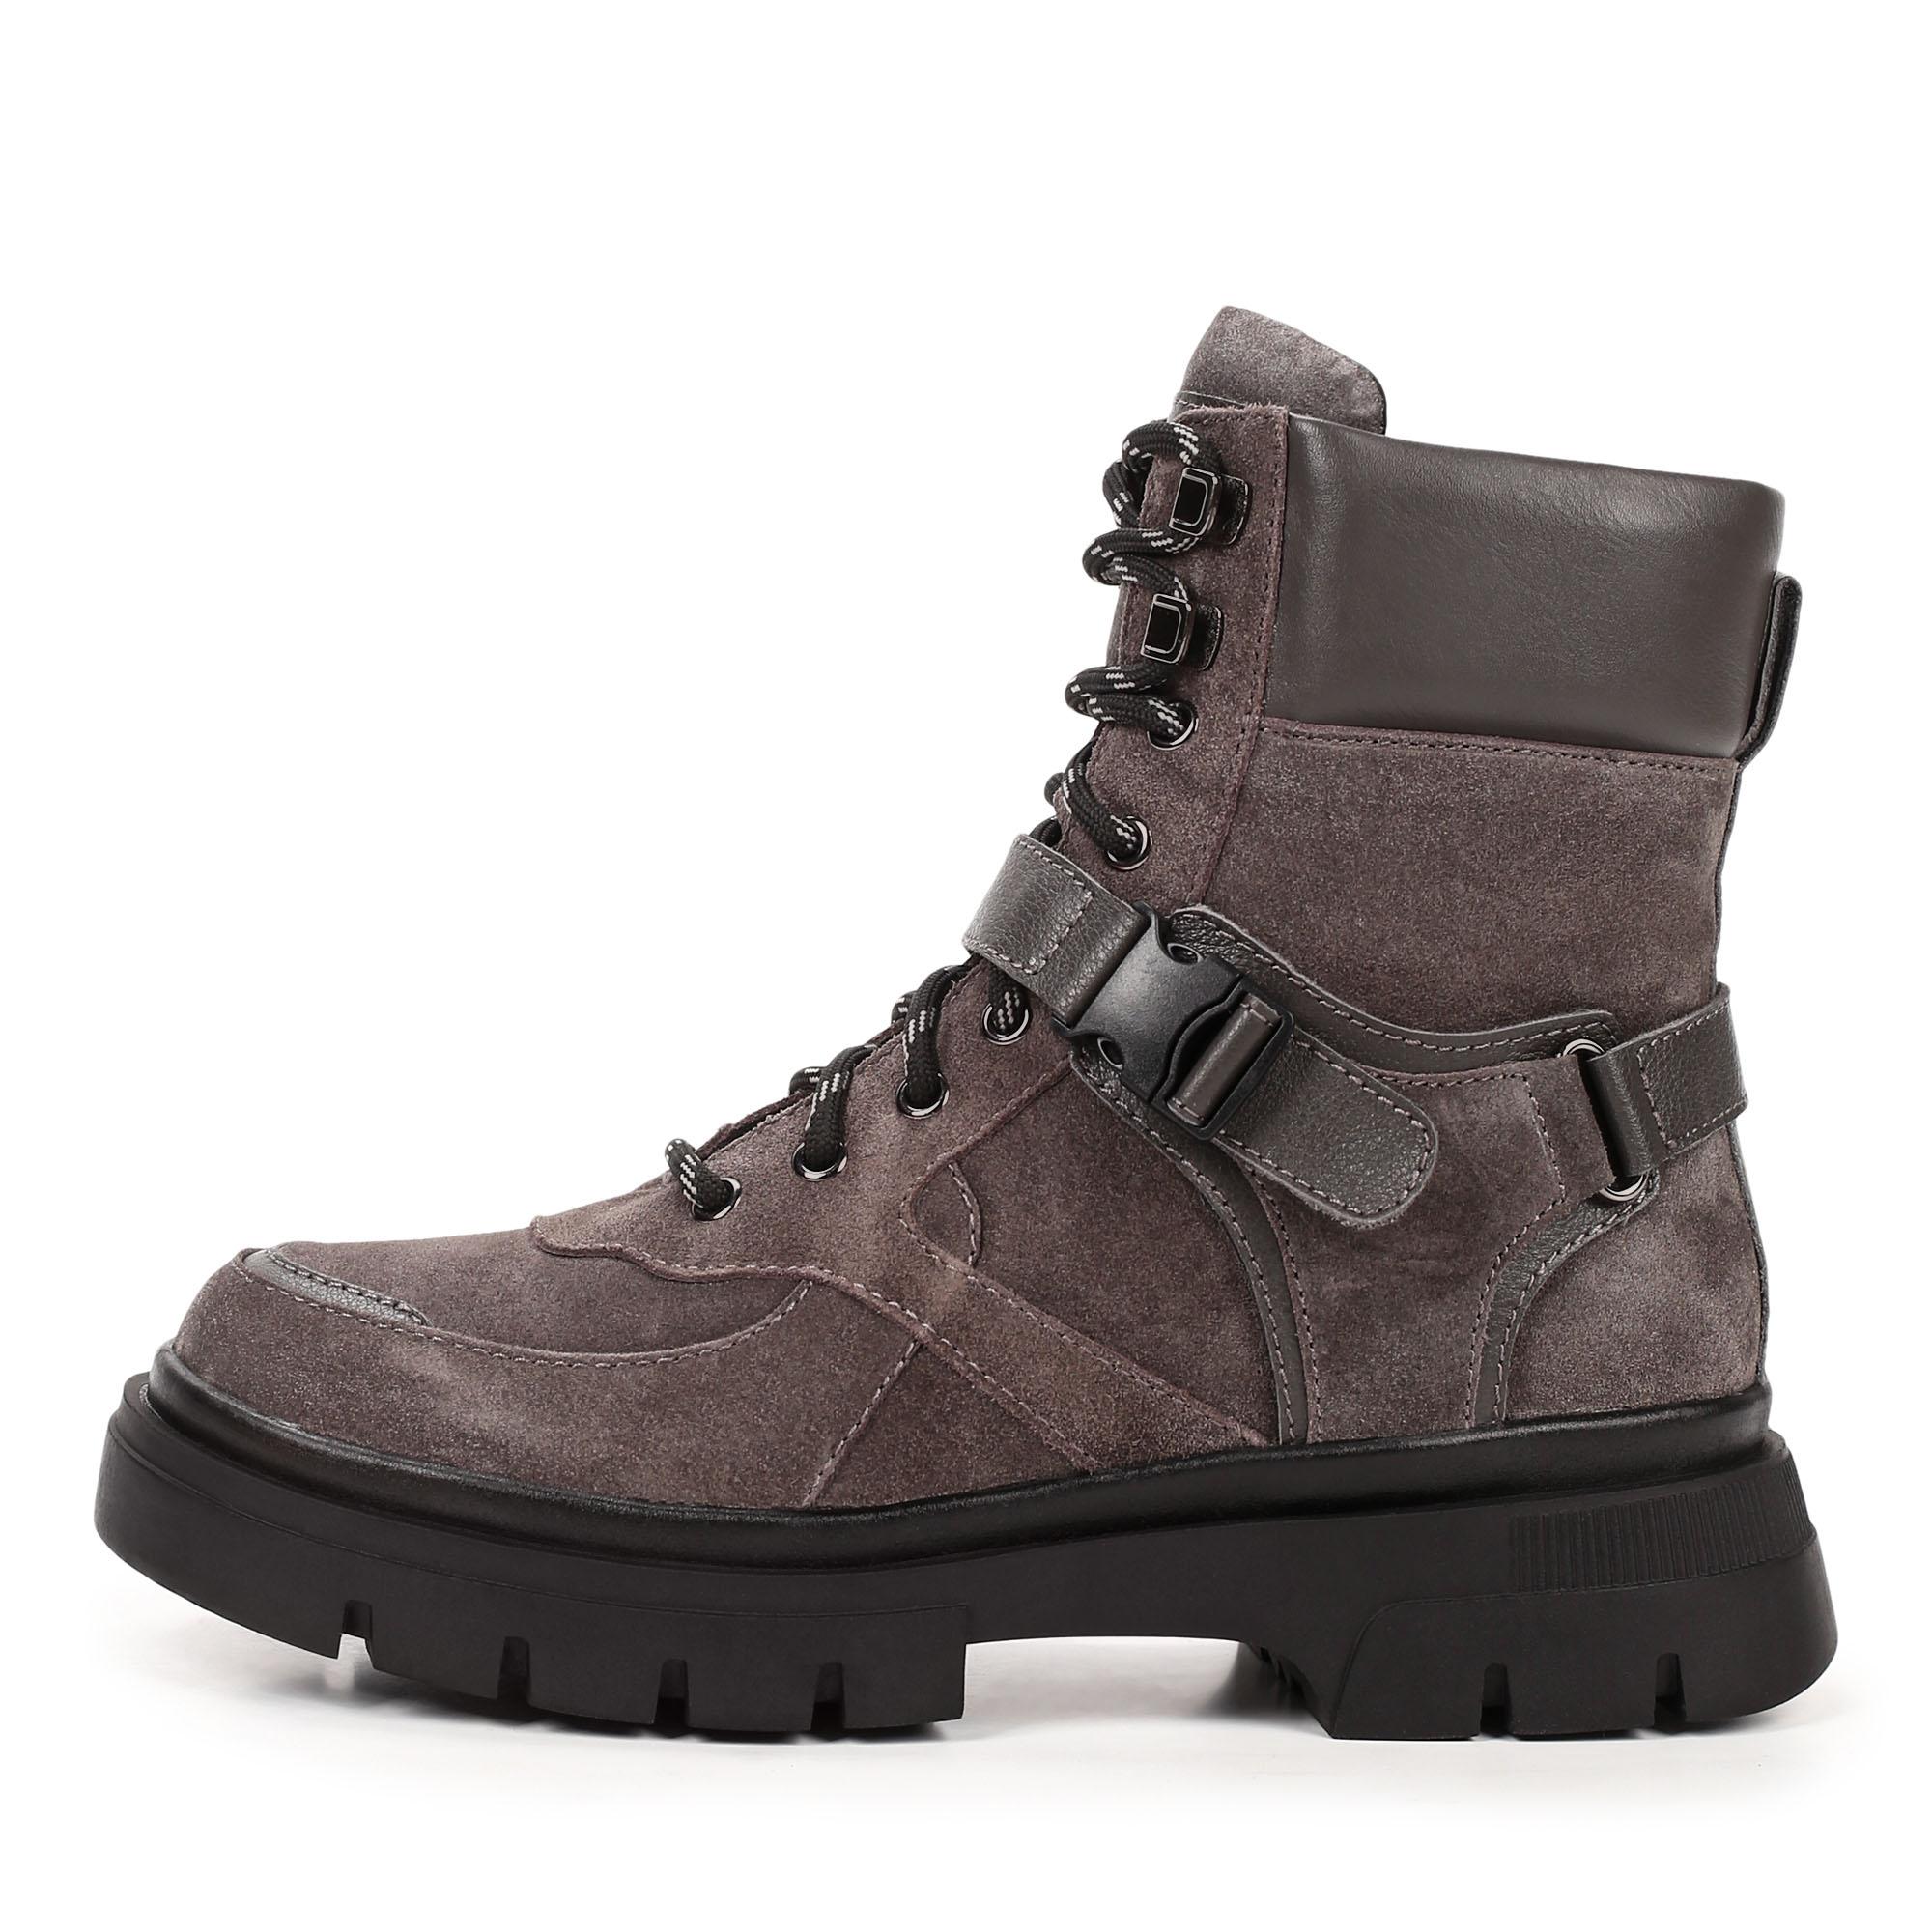 Ботинки Thomas Munz 233-688A-30210